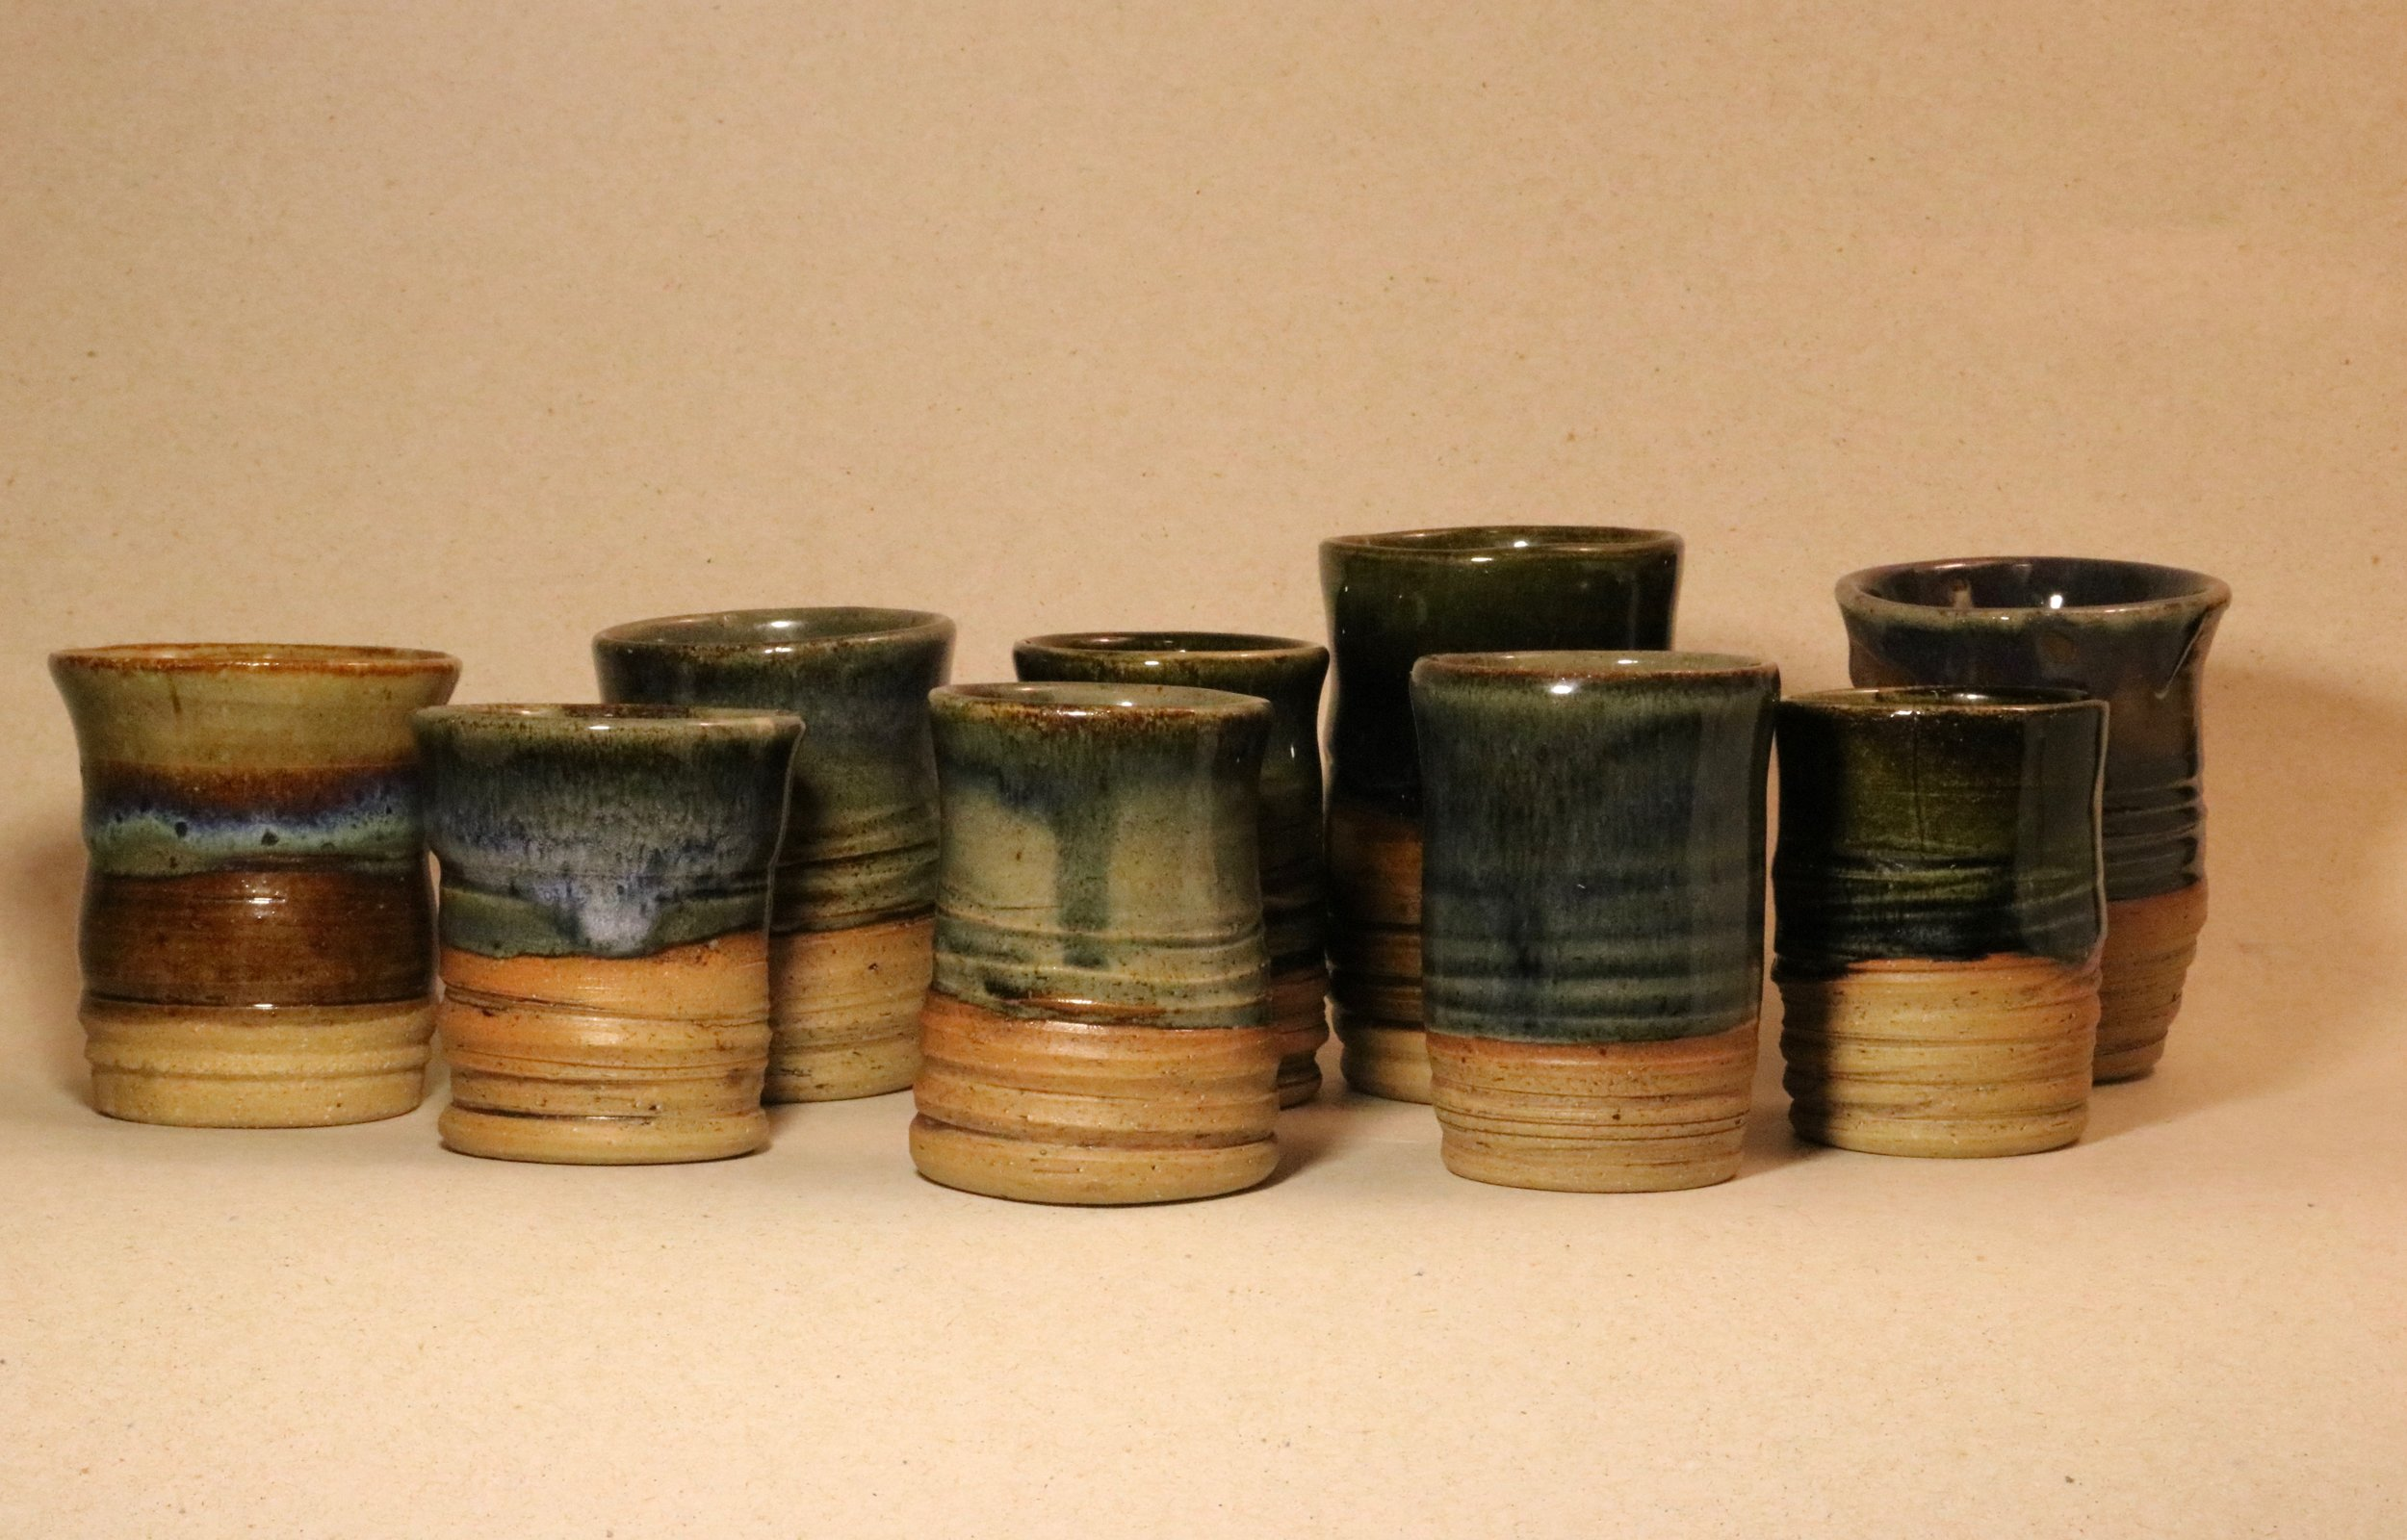 $40, (9 cups) Cynthia June 16